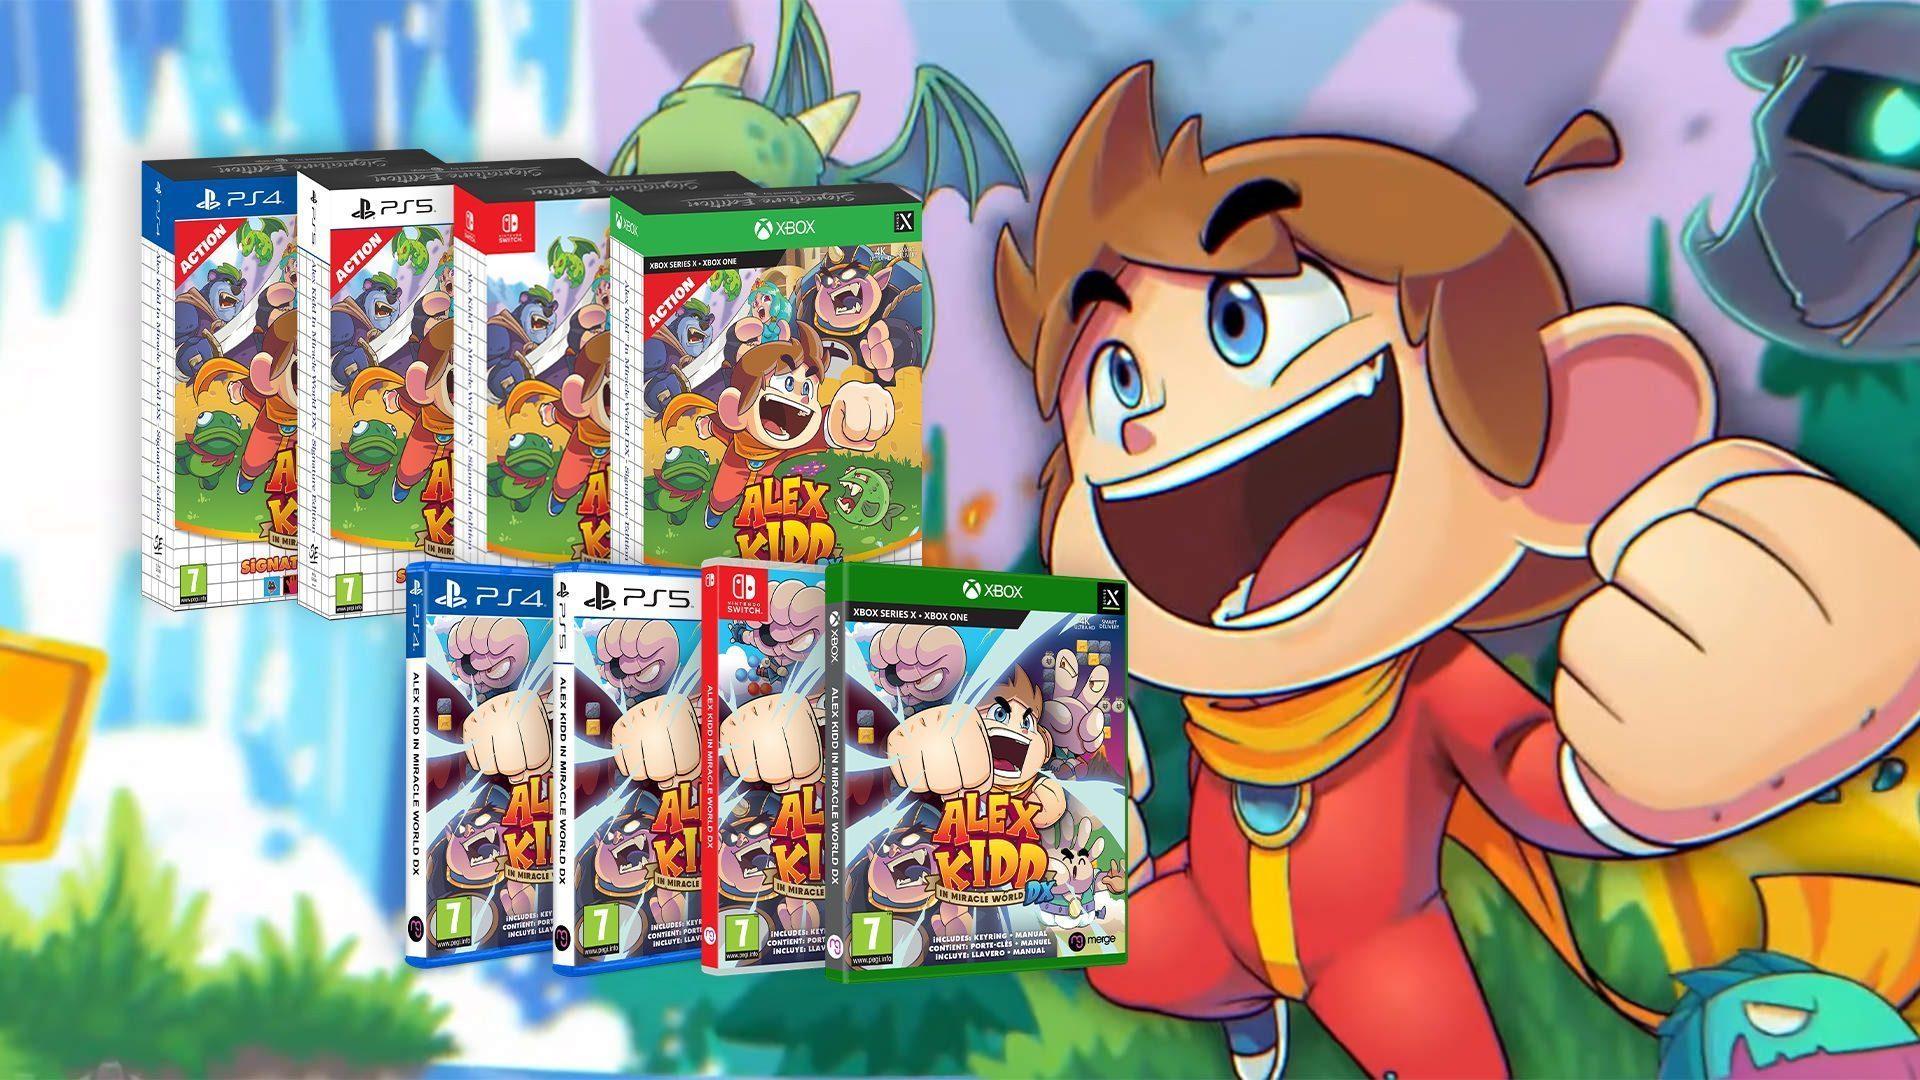 F-_Just-For-Games_Jeux_Alex-Kidd_ASSETS_Asset_Alex_Kidd_1920x1080